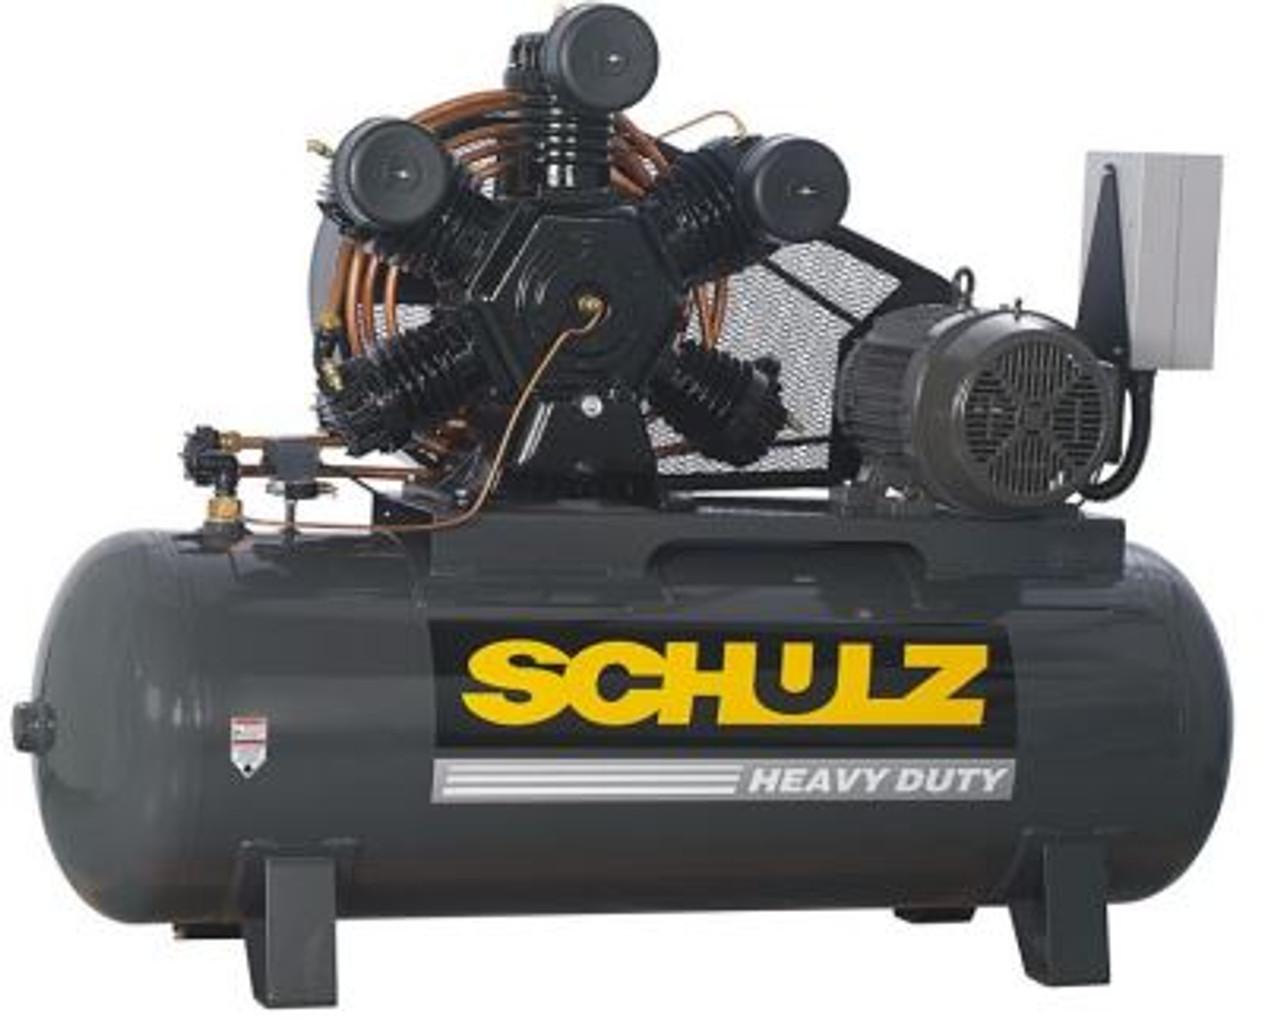 Schulz 20120HWV80X-3 20 HP 208-230 Volt Two Stage 120 Gallon Air Compressor